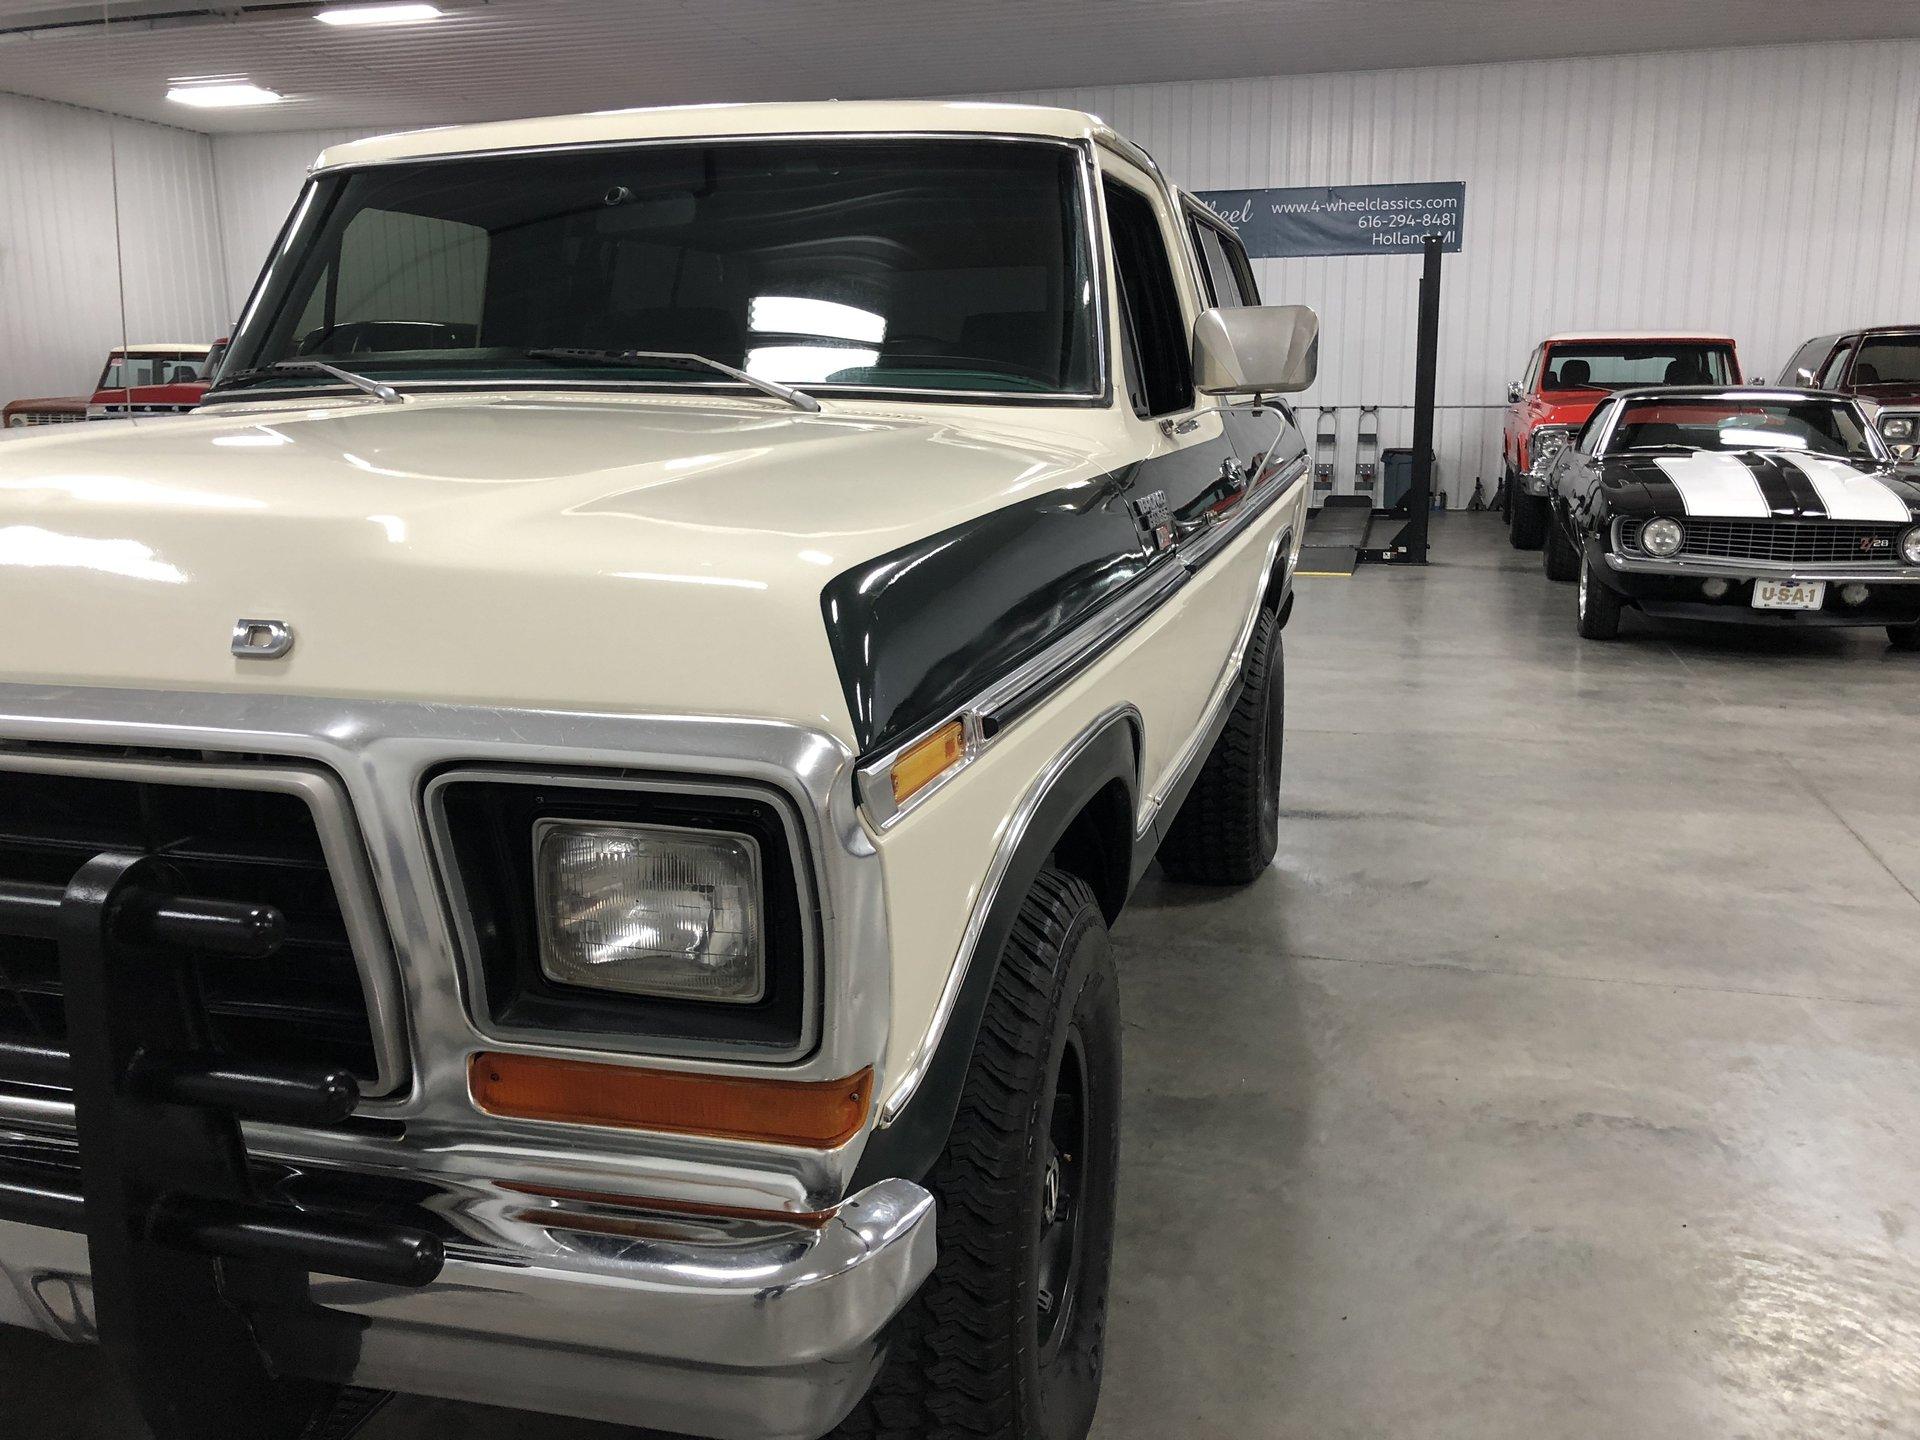 1979 Ford Bronco for sale #85880 | MCG